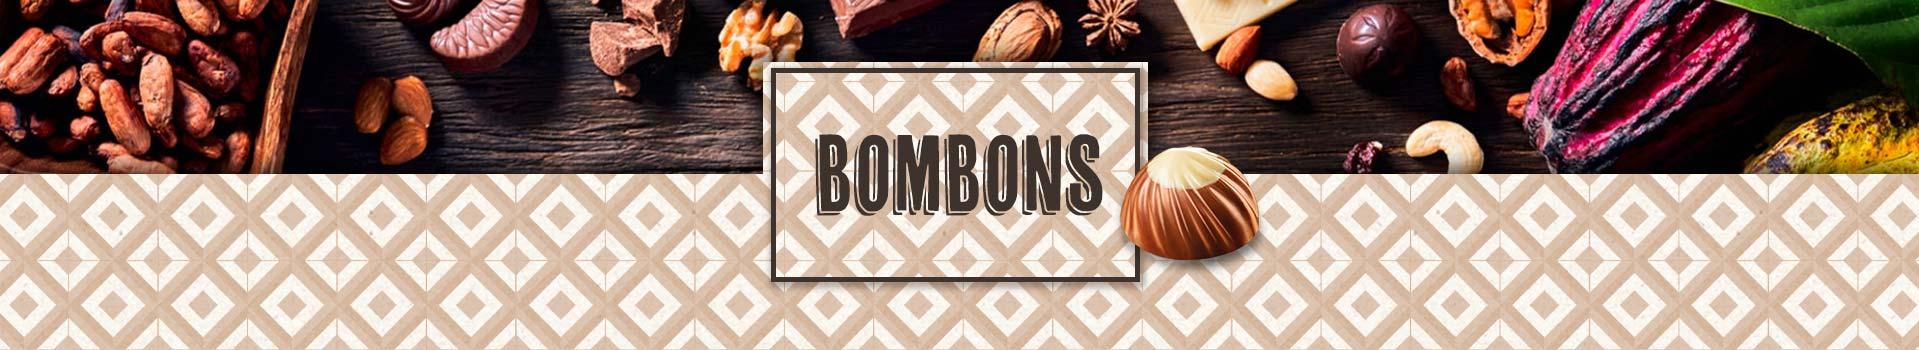 Bombons